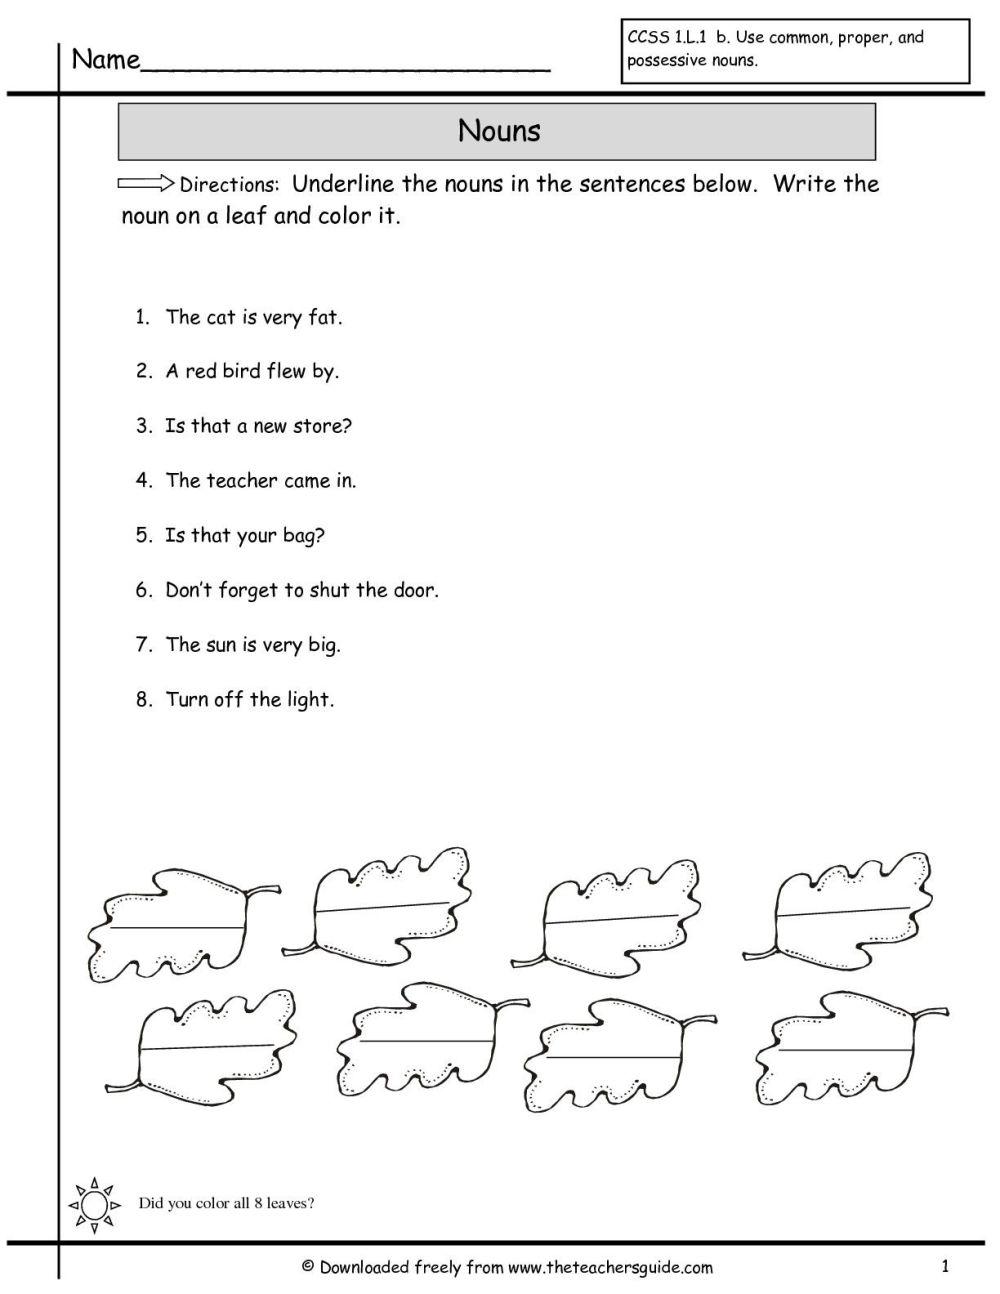 medium resolution of 7 Best Possessive Pronouns Worksheets 3rd Grade images on Best Worksheets  Collection